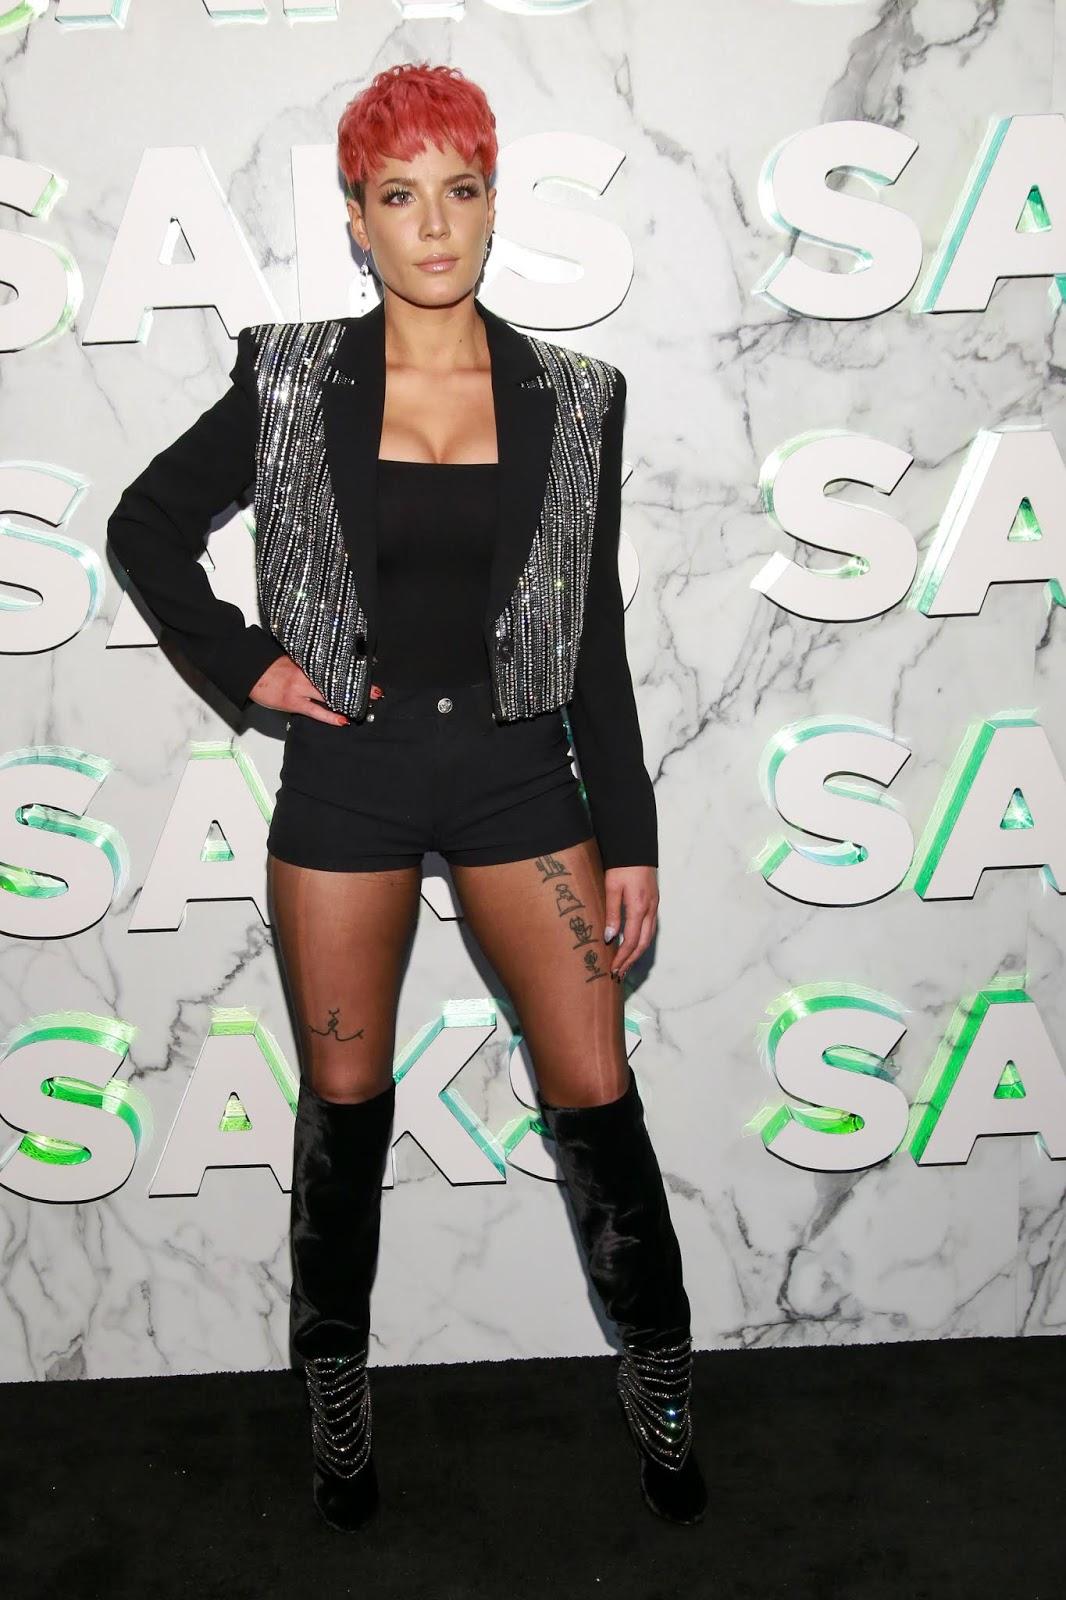 Halsey - Saks celebrates new main floor at Saks Fifth Avenue in NYC - 02/07/2019